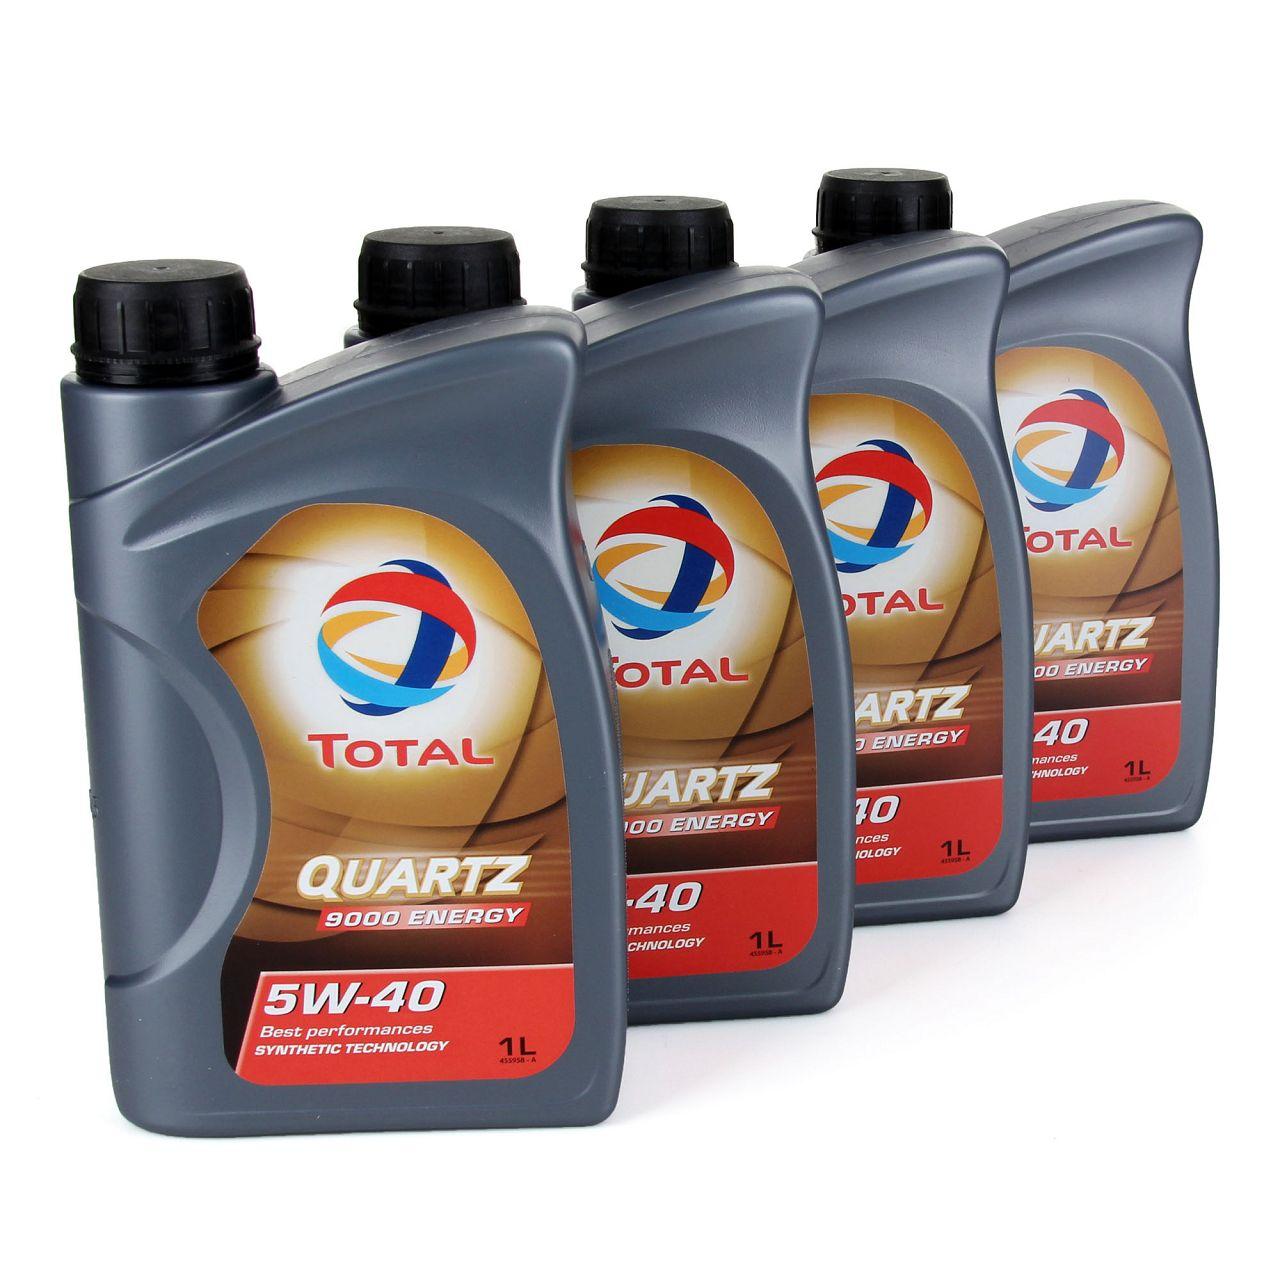 TOTAL QUARTZ 9000 ENERGY 5W-40 Motoröl BMW LL-01 MB 229.5 229.3 - 4 L 4 Liter